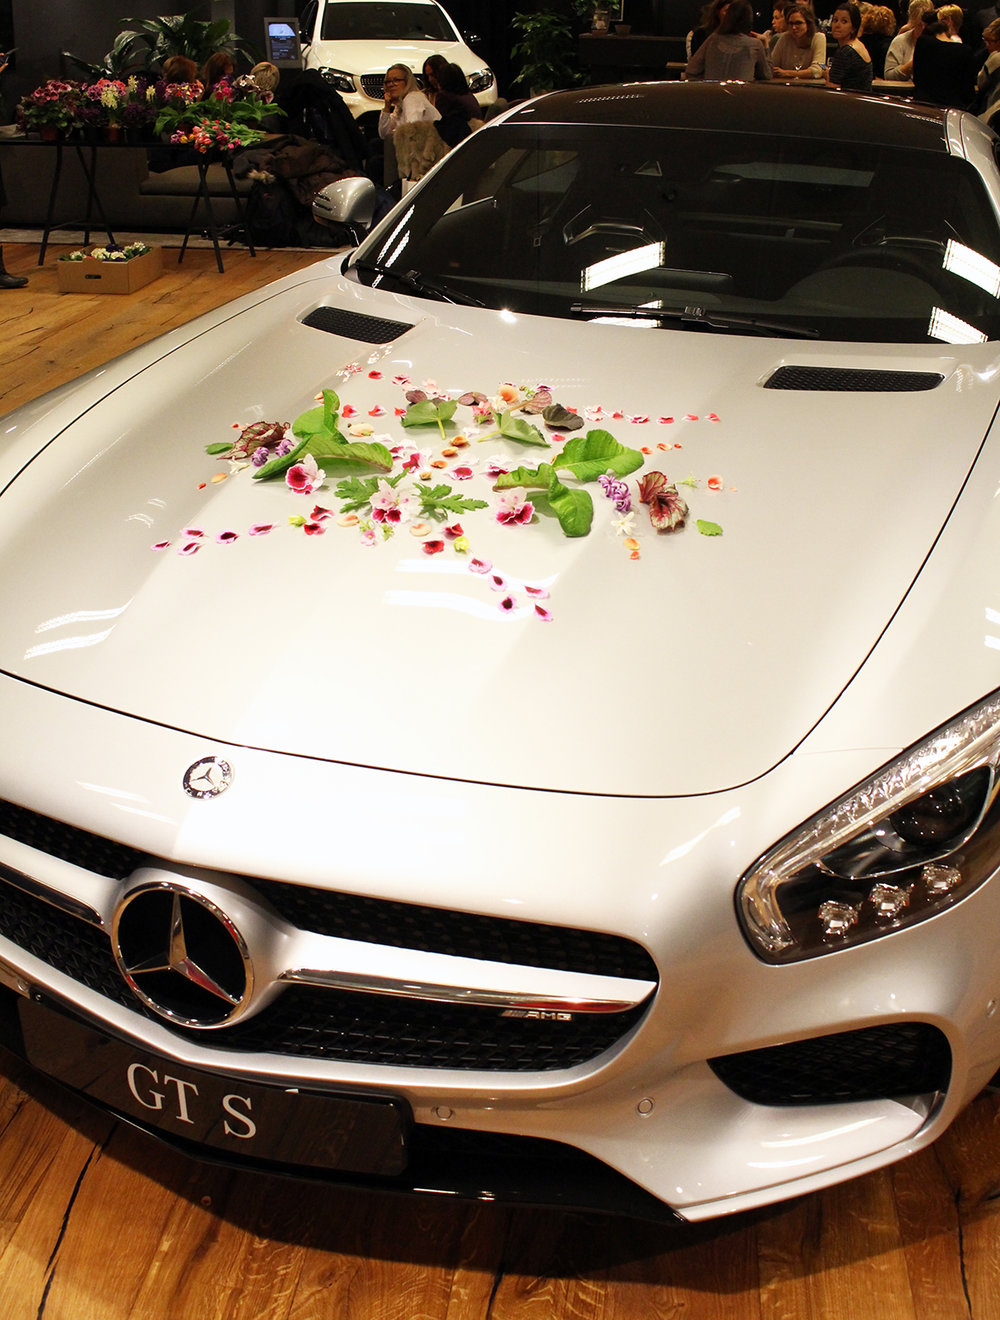 Mercedes_Benz_Blomsterpill_HannaWendelbo